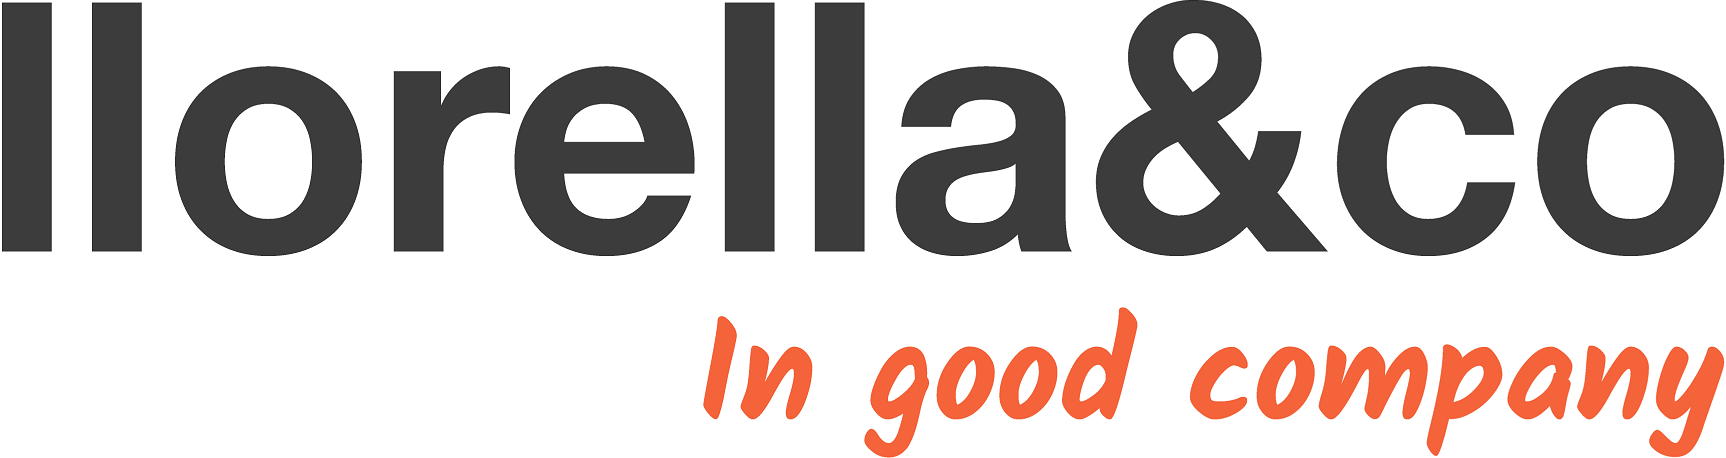 logotipo Llorella&co